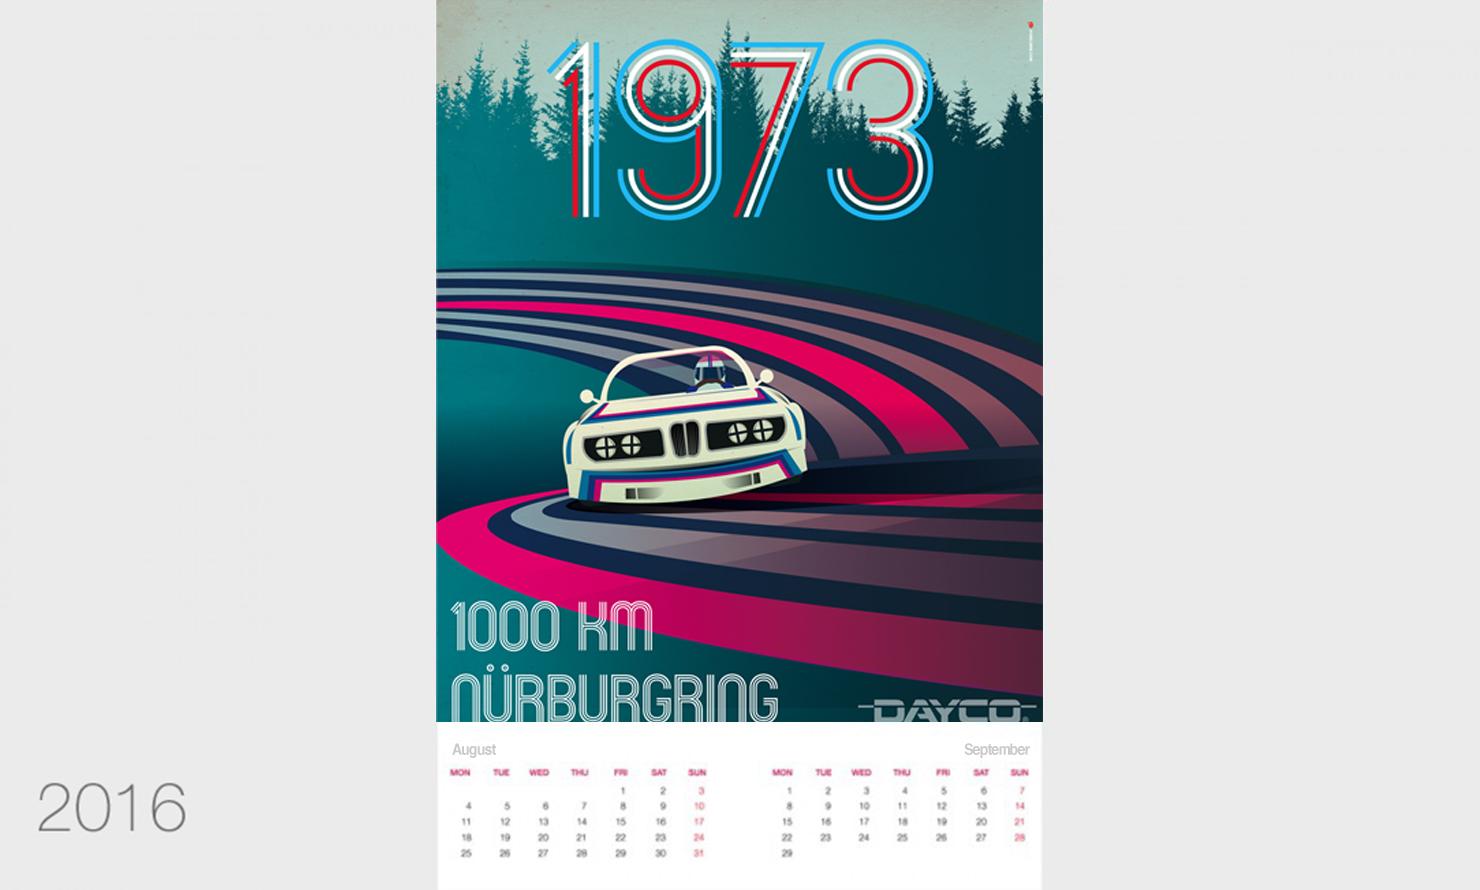 https://kubelibre.com/uploads/Slider-work-tutti-clienti/dayco-calendario-2016-5.jpg